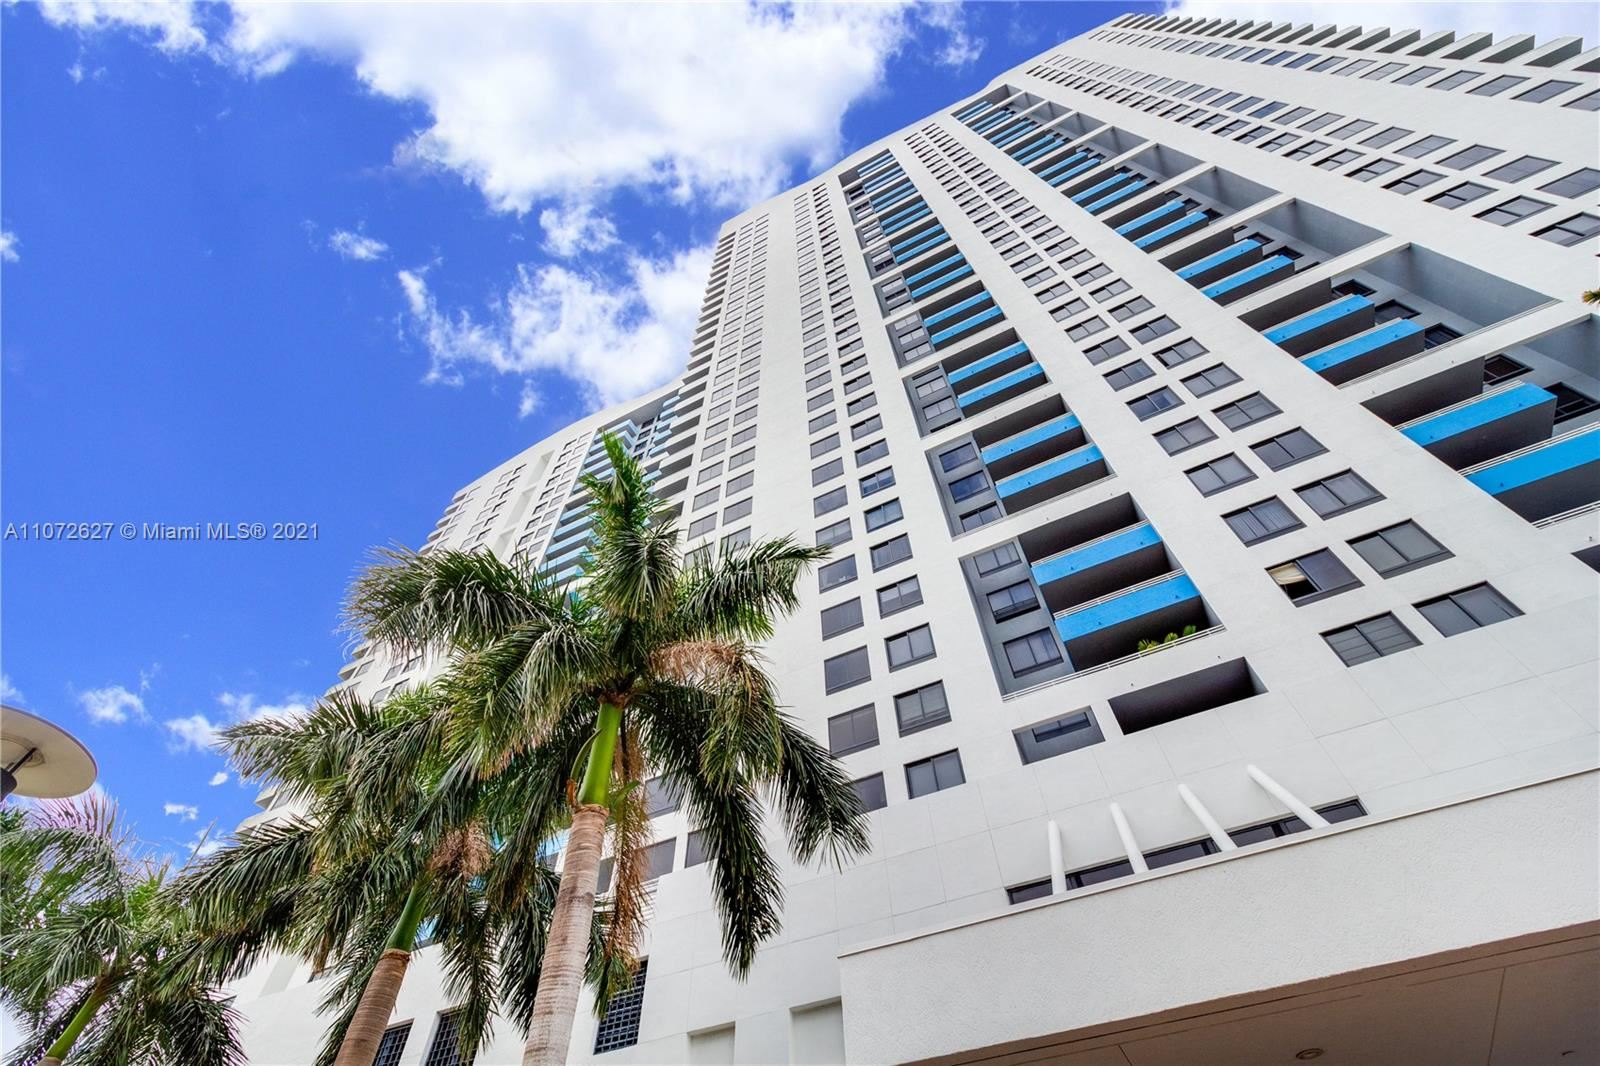 1330 West Ave #1811, Miami Beach, FL 33139 - #: A11072627